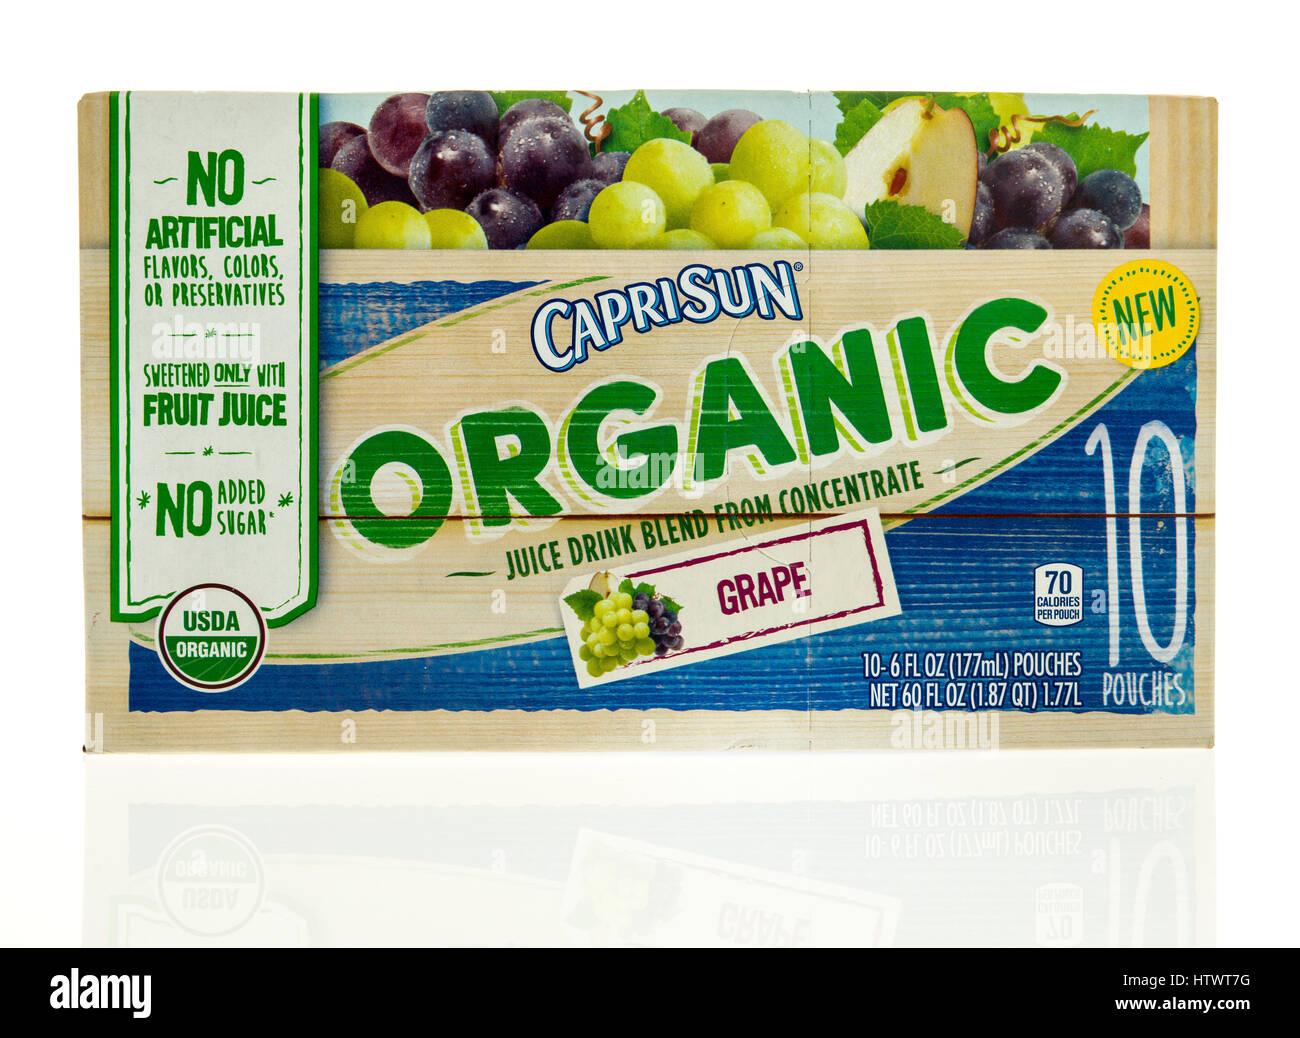 Winneconne, WI - 5 March 2017: Box of Caprisun organic juice drink on an